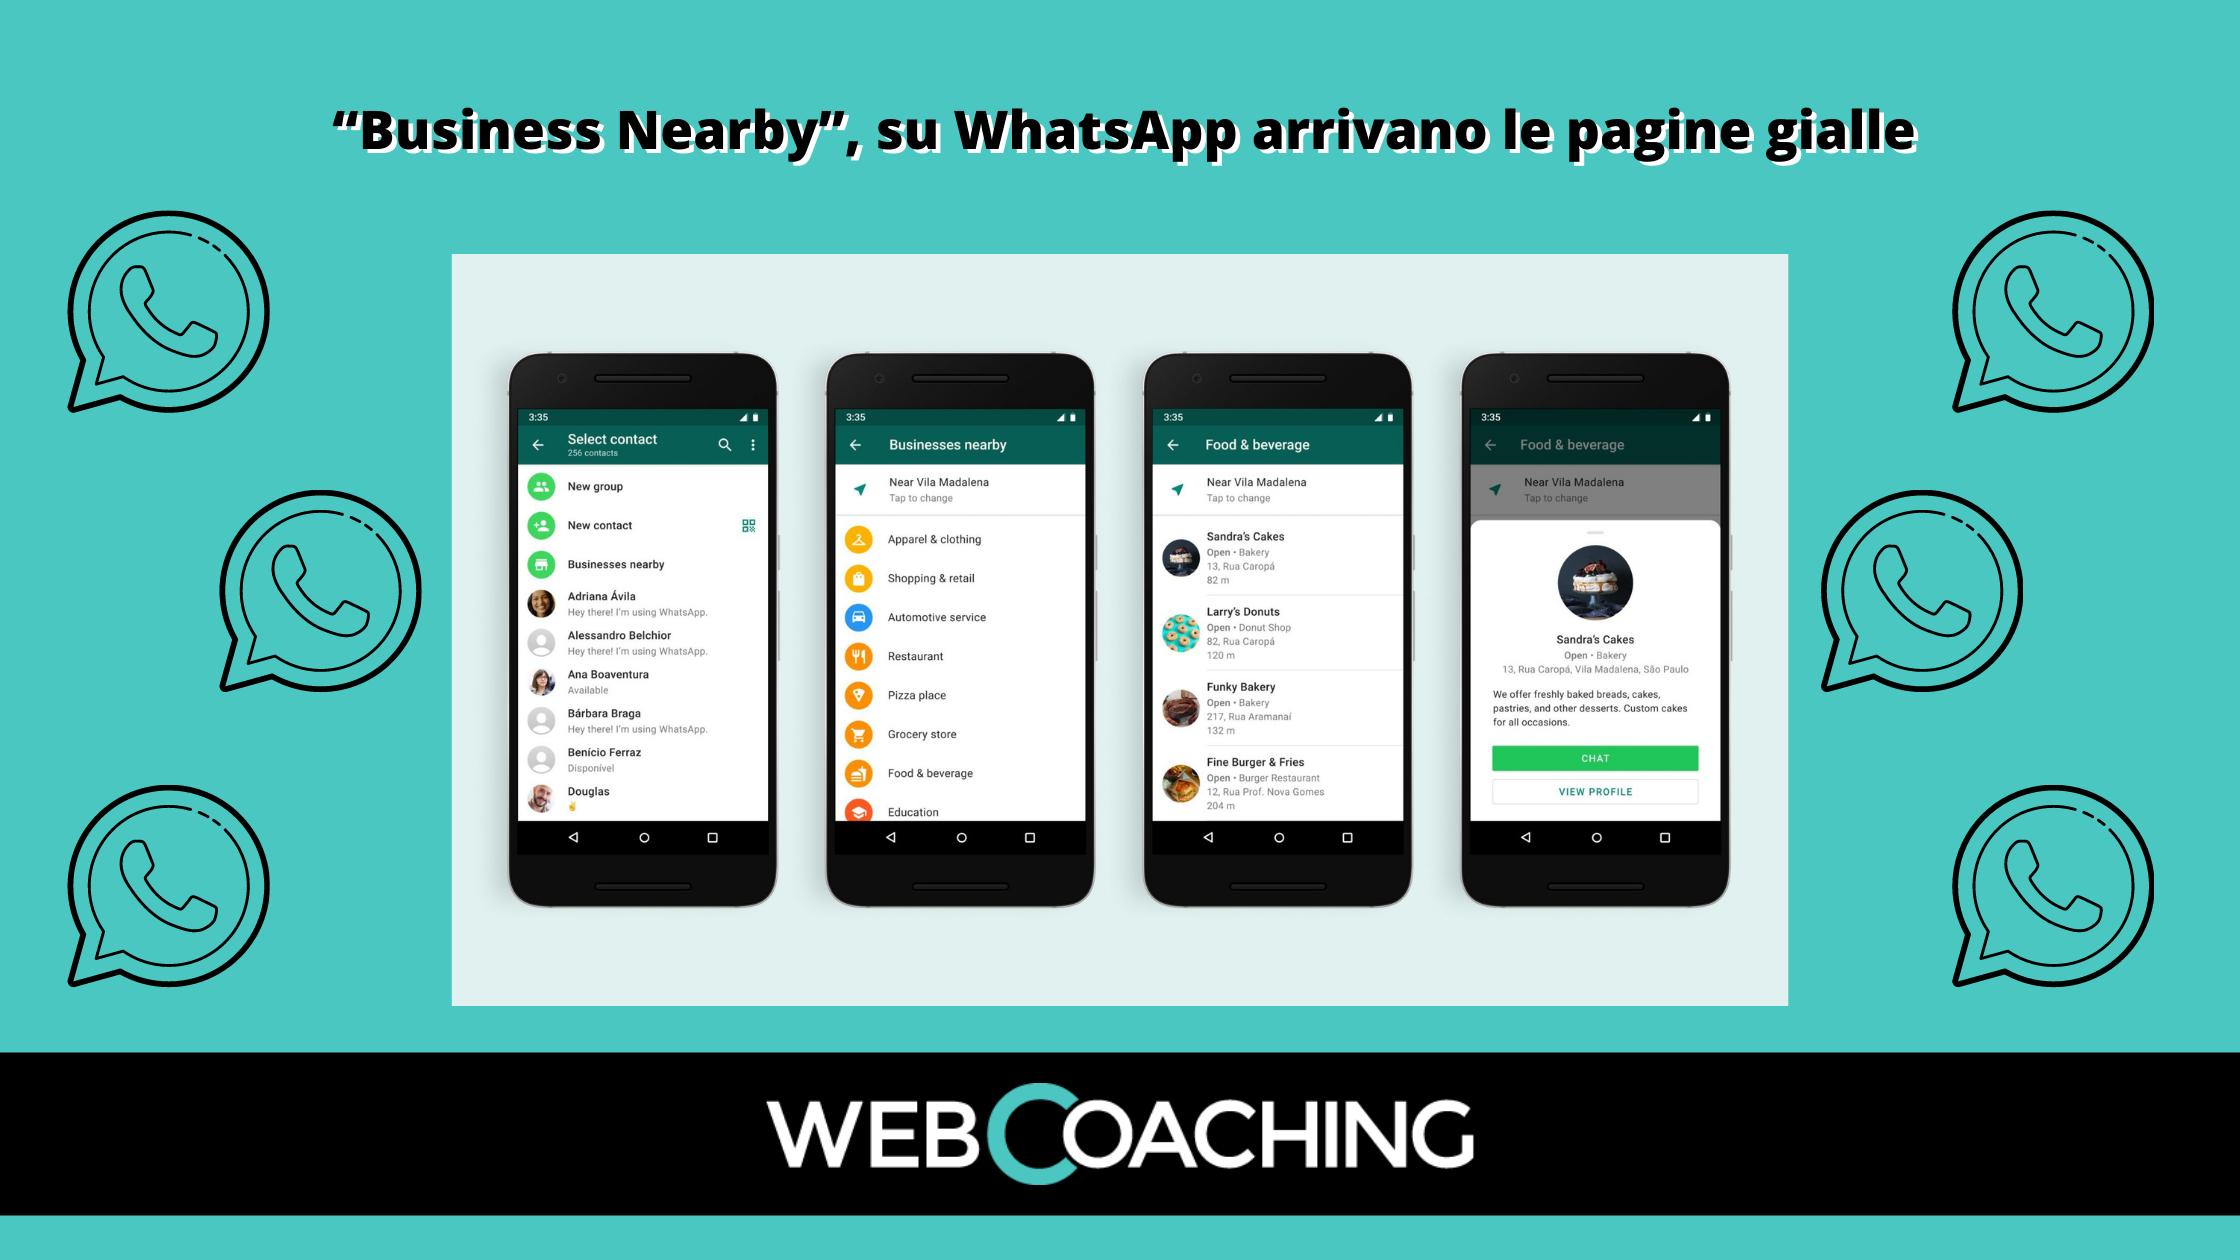 Whatsapp Business Nearby